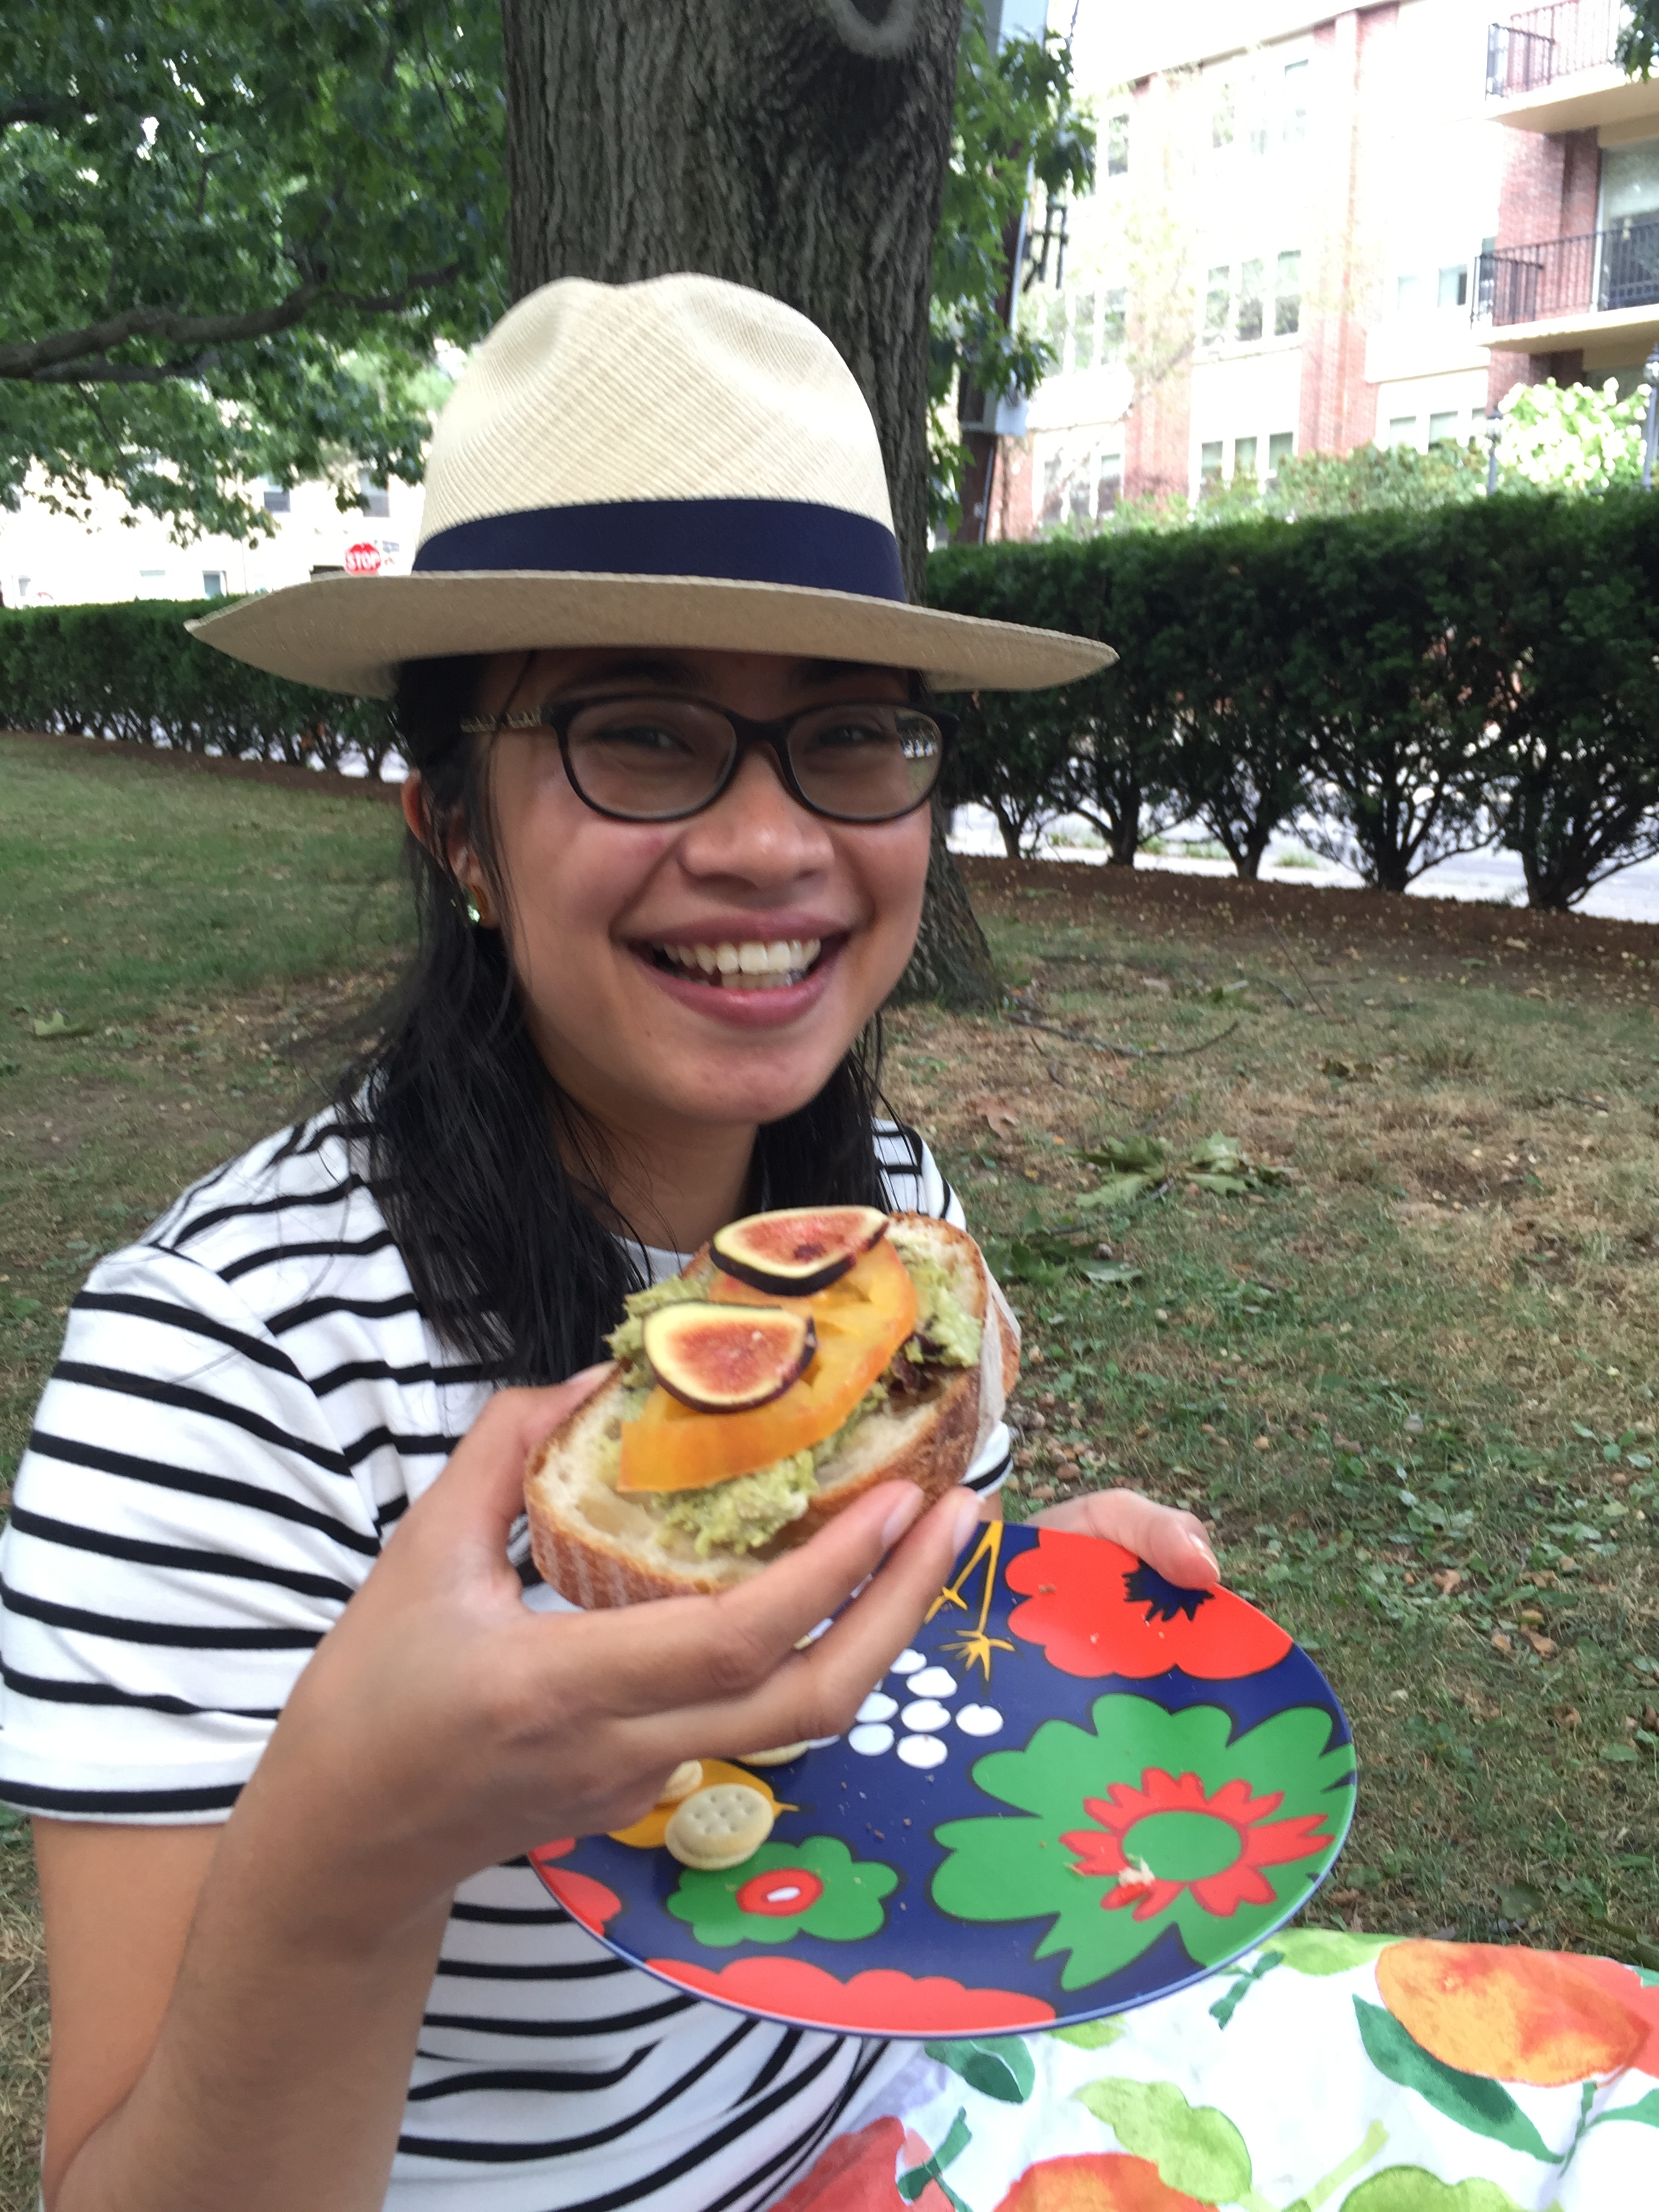 happy picnicker